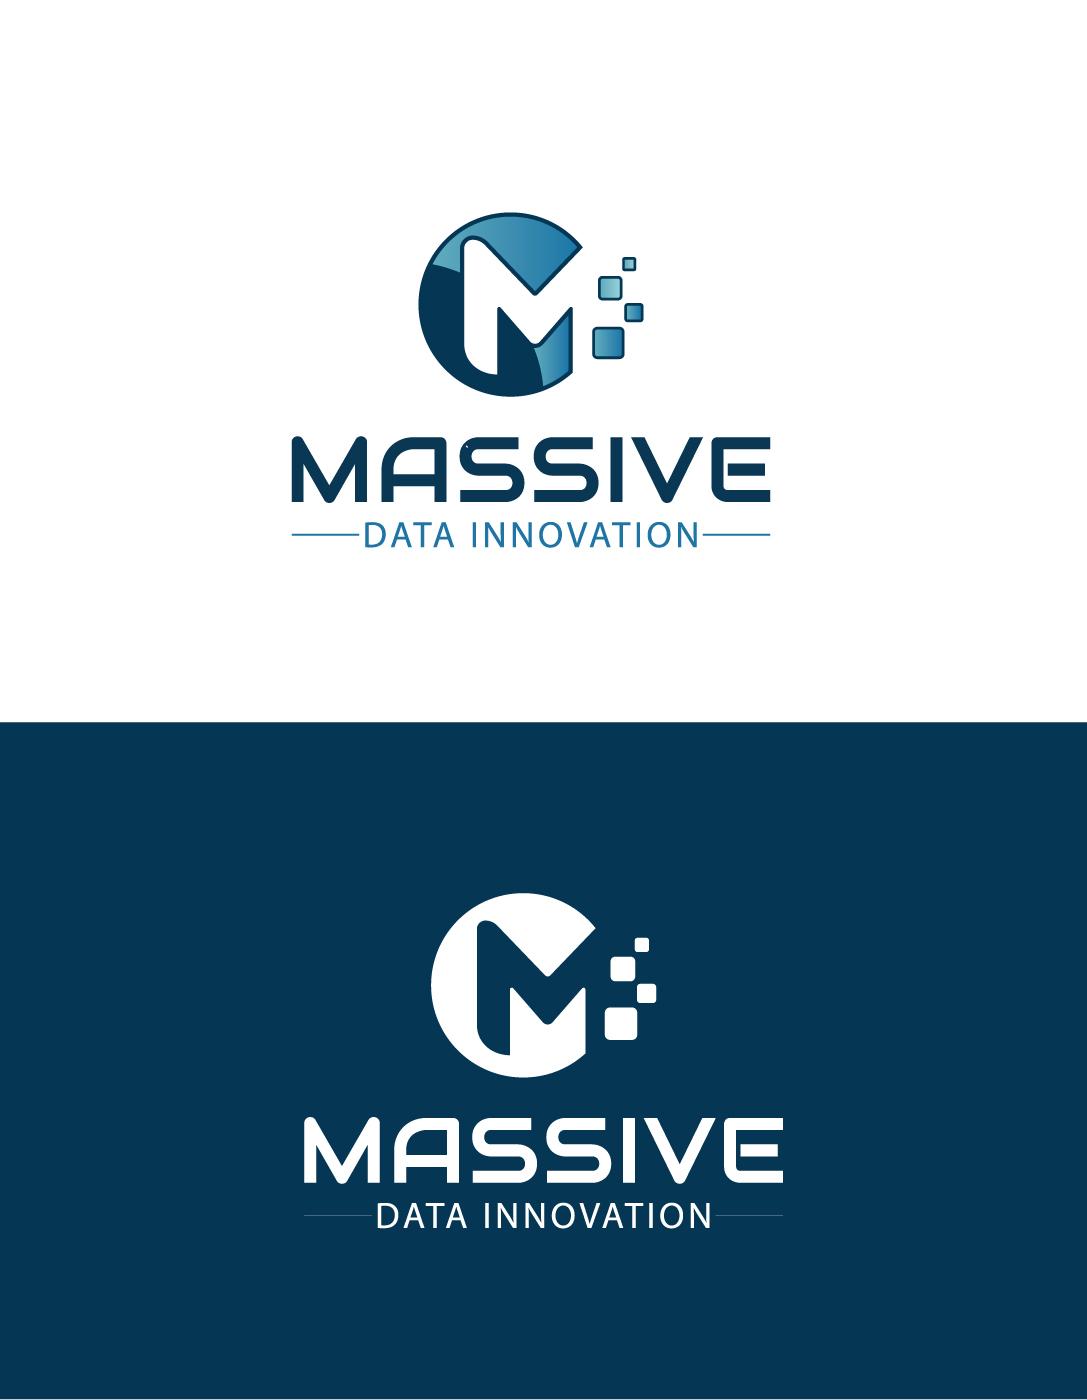 Logo Design by Sami Baig - Entry No. 443 in the Logo Design Contest MASSIVE LOGO.